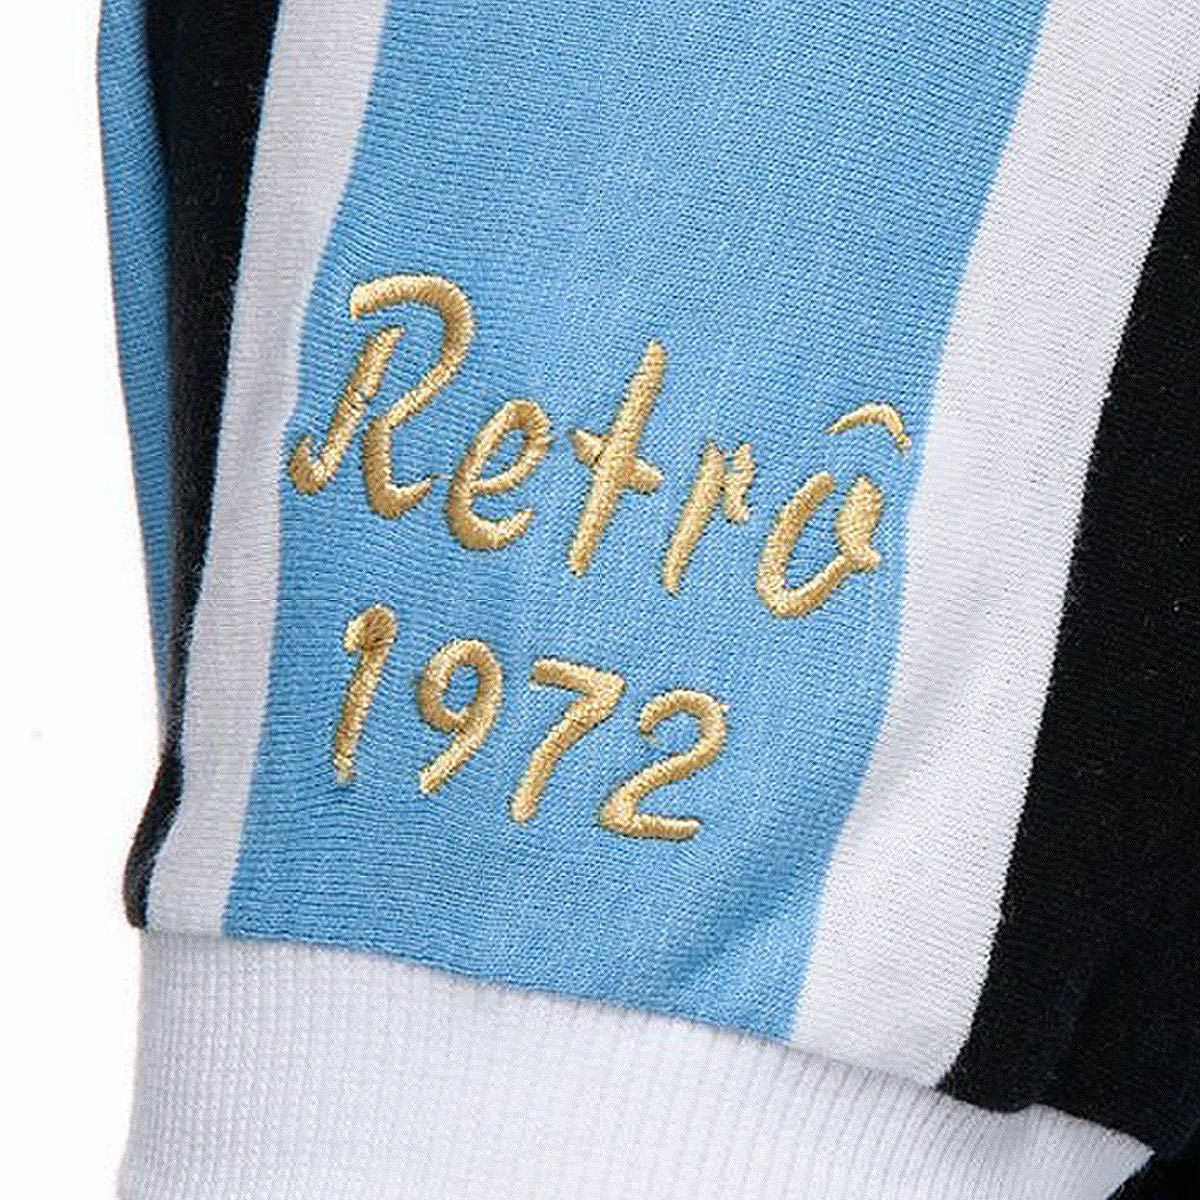 Camisa Retrô Gremio 1972 Masculina